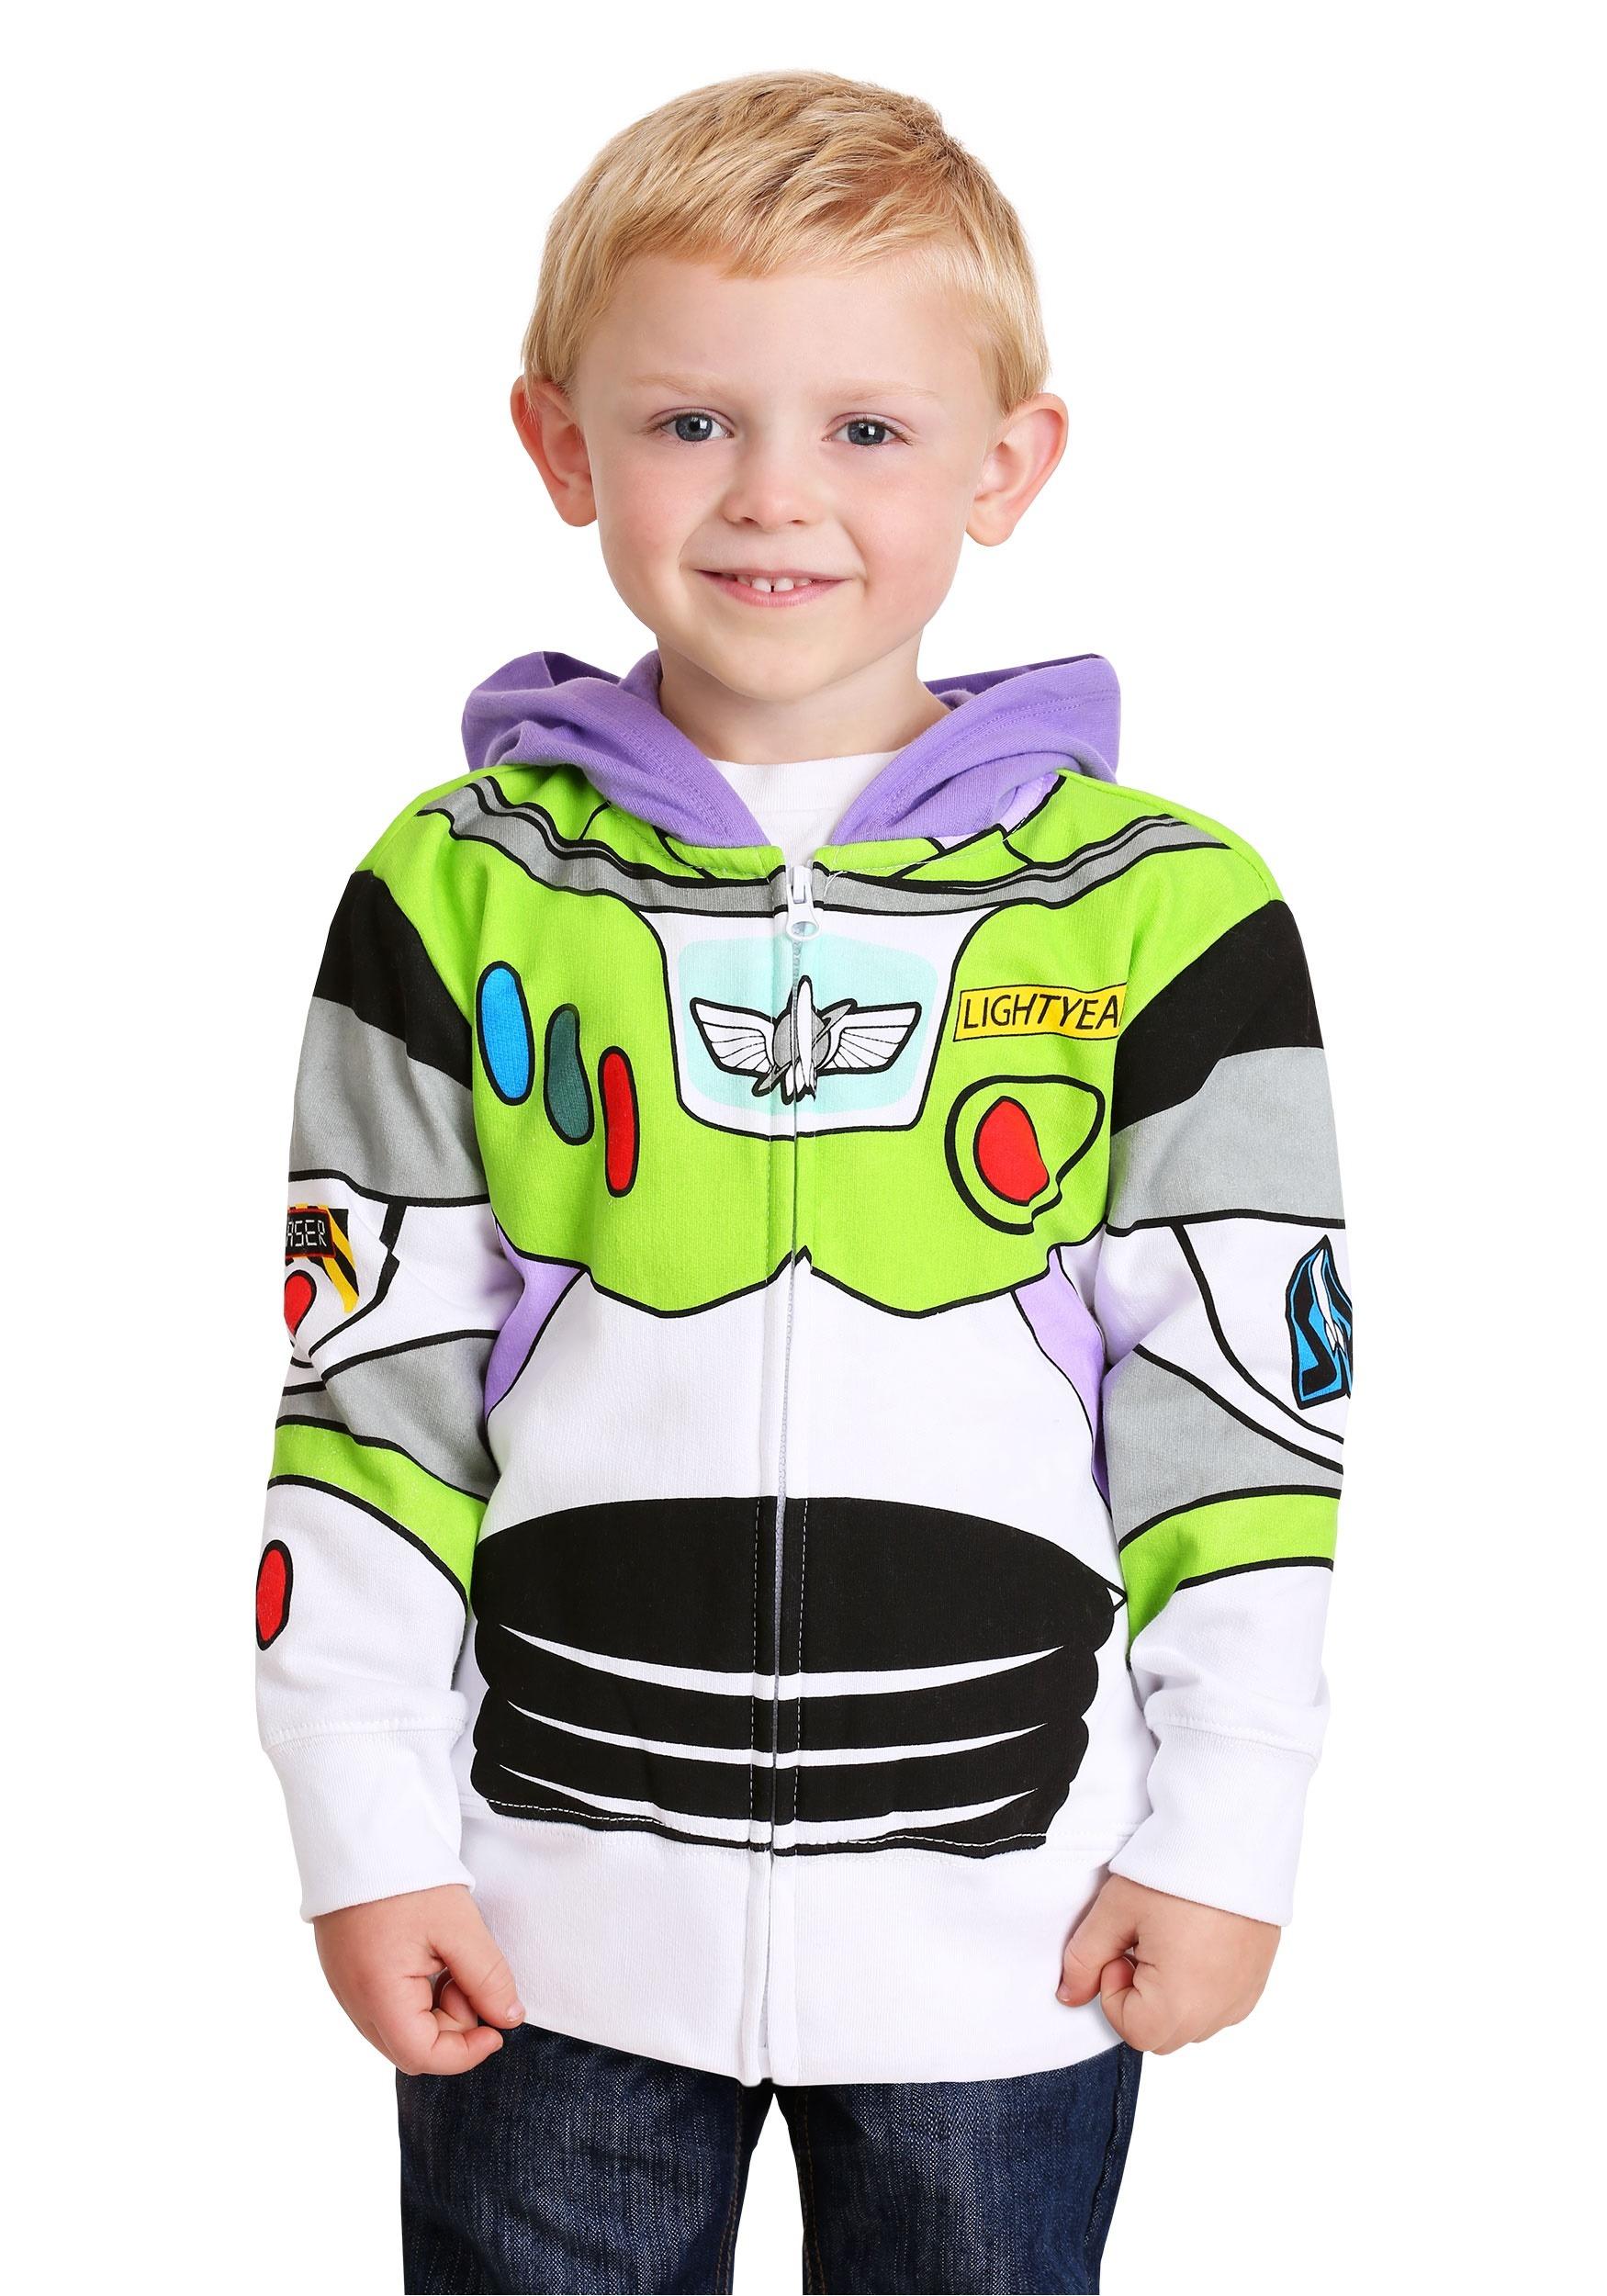 Toddler Buzz Lightyear Costume Hoodie-update1  sc 1 st  Fun.com & Toddler Buzz Lightyear Costume Hoodie